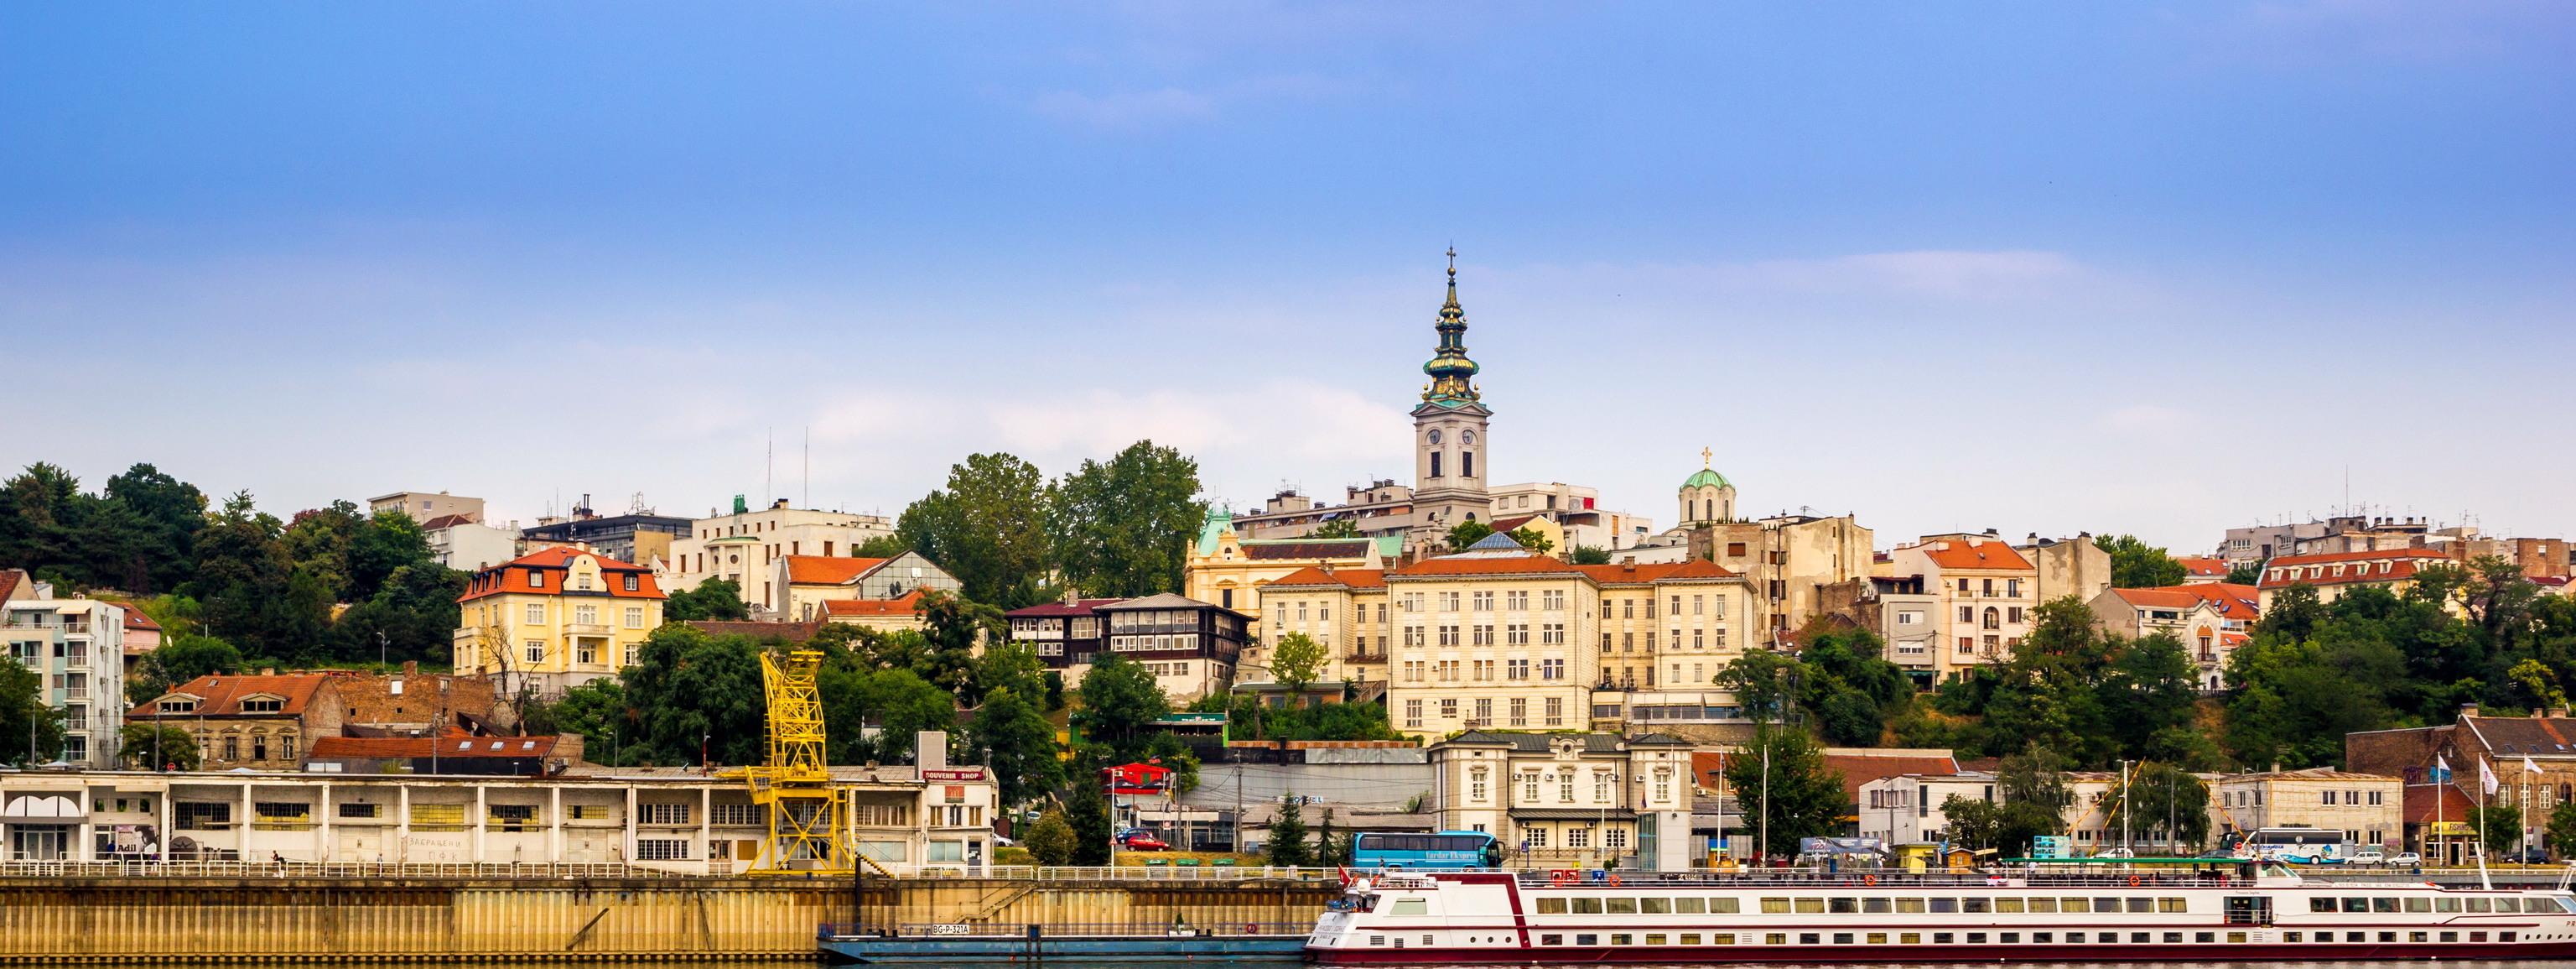 знакомства богданович ольга викторовна белоруссия